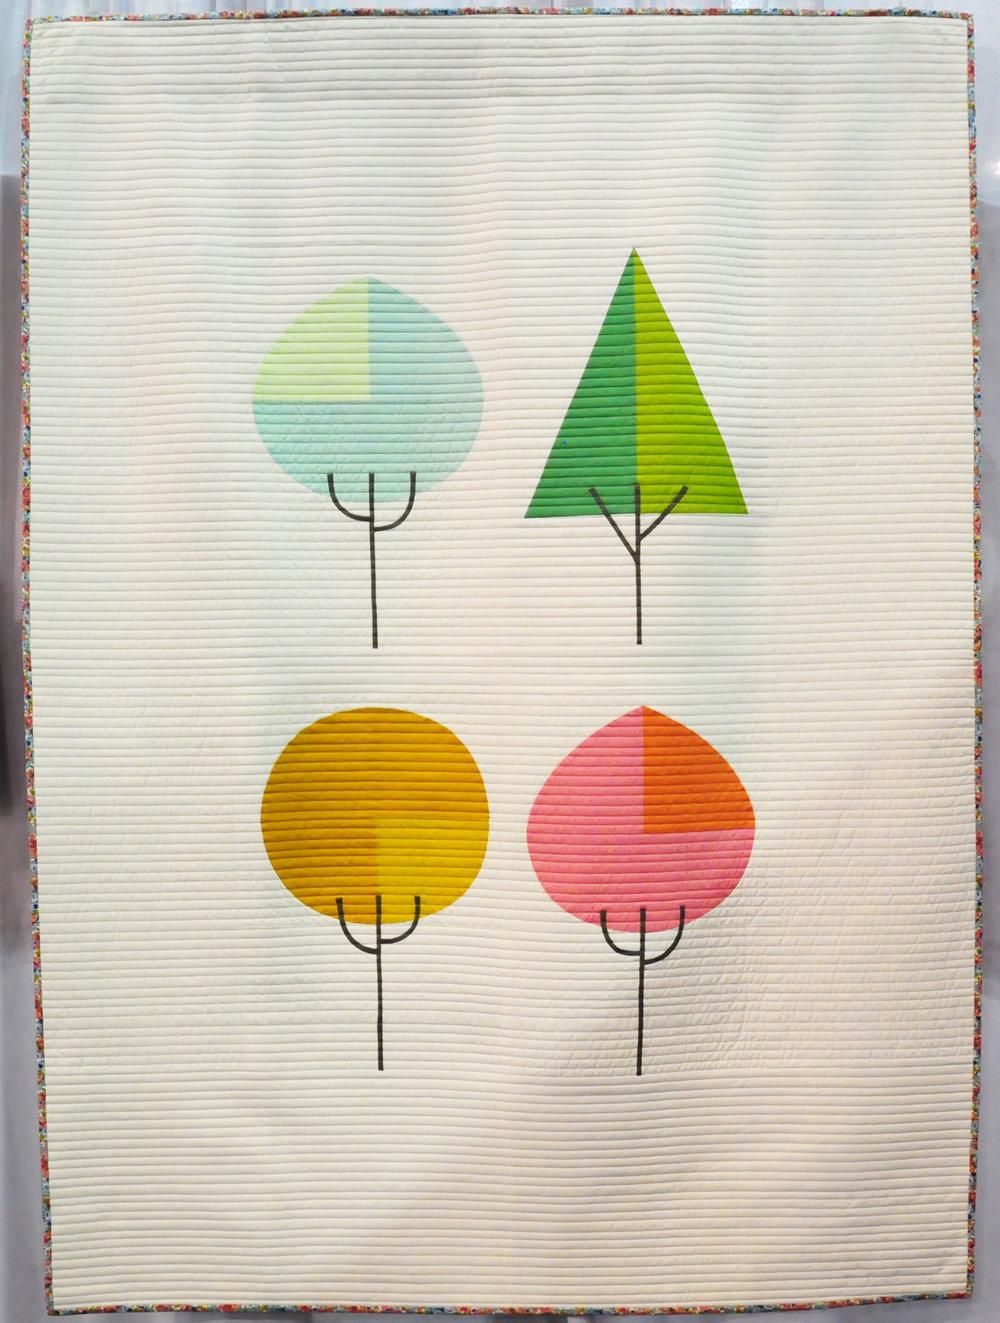 Die Beem (Trees) by Lindsey Neill (@penandpaperpatterns)